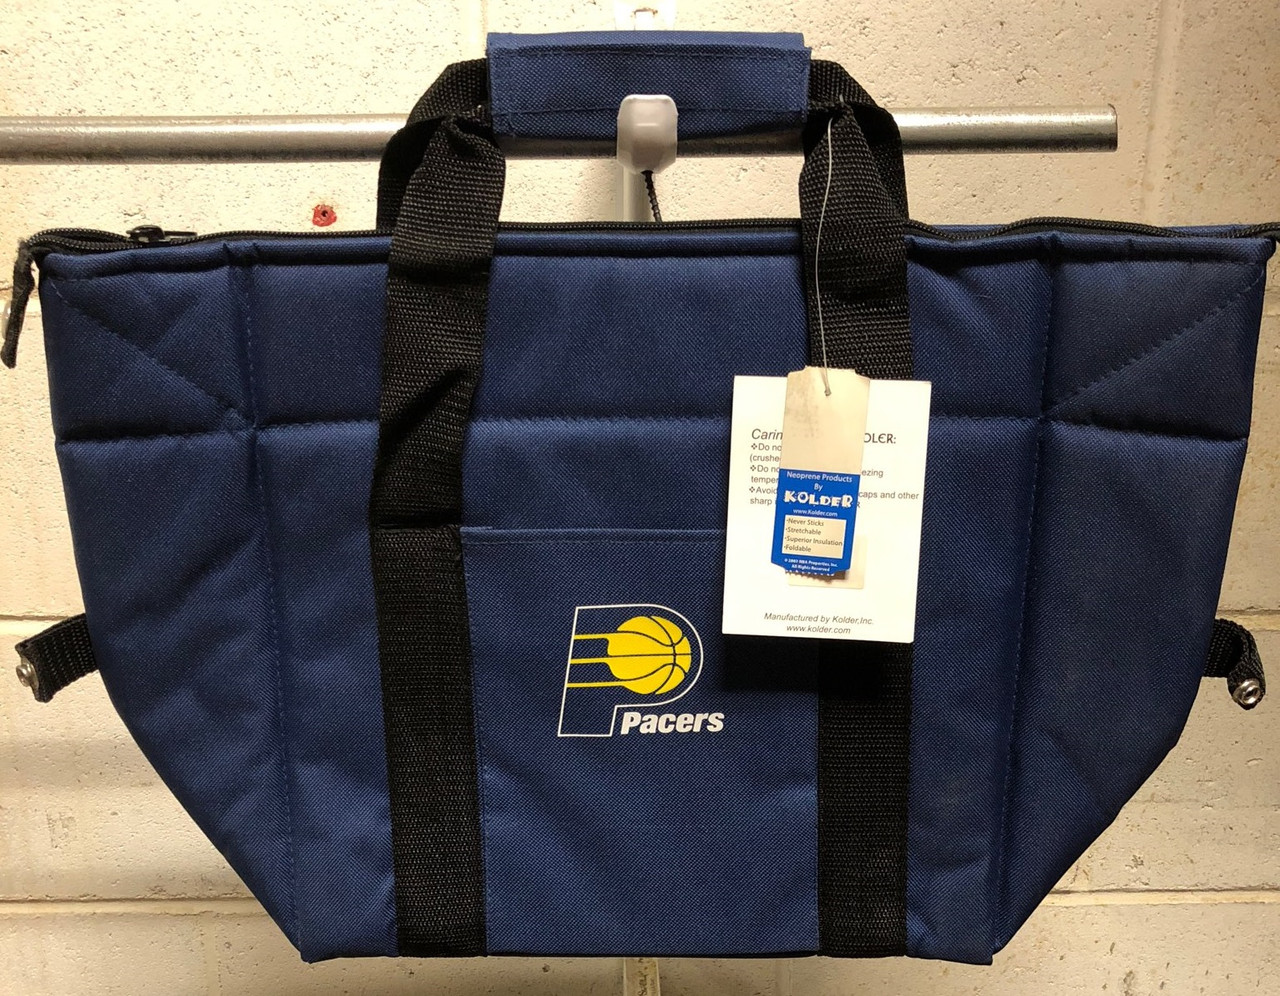 Indiana Pacers Kooler Bag 12 Pack